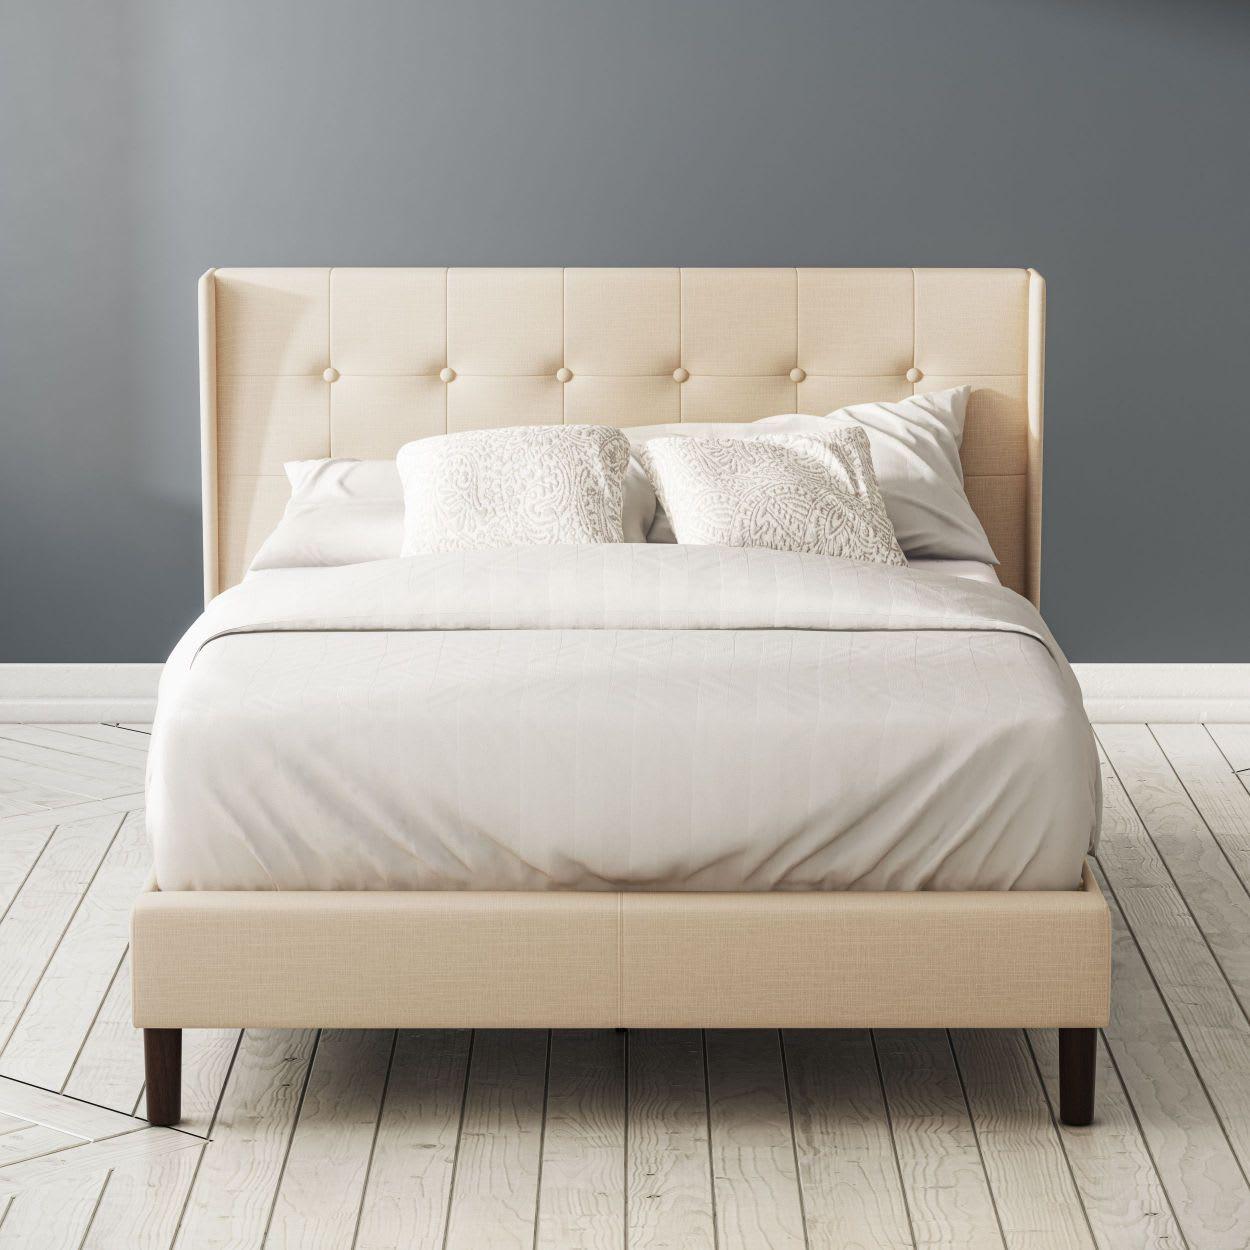 Athena upholstered platfrom bed frame